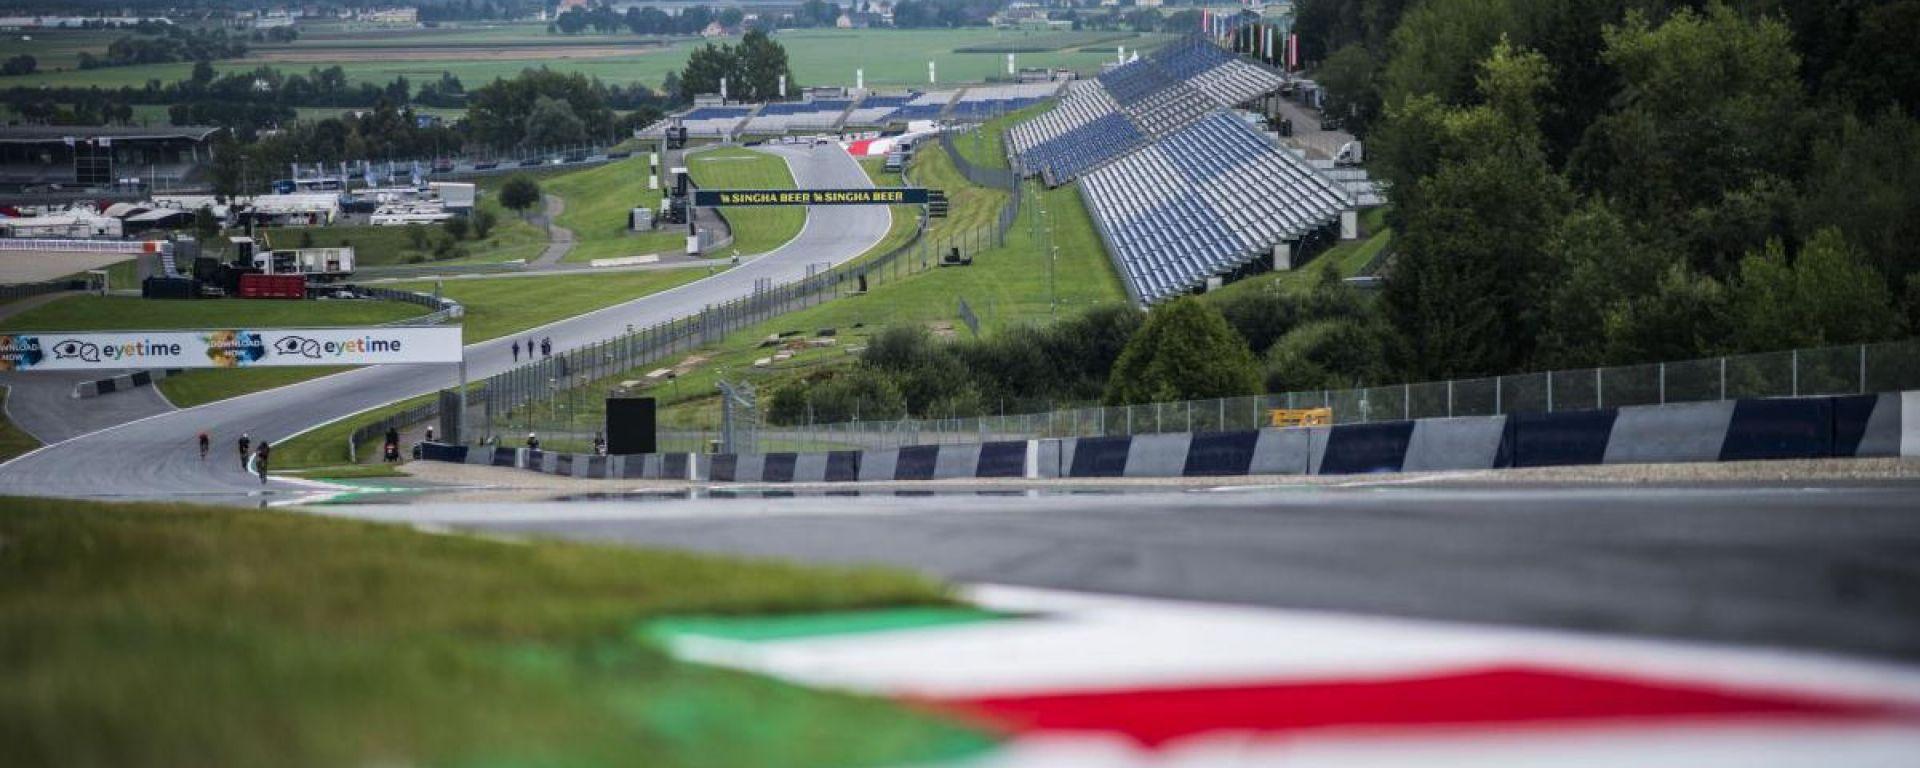 Tutte le info sul MotoGP Austria 2020: orari, meteo, risultati